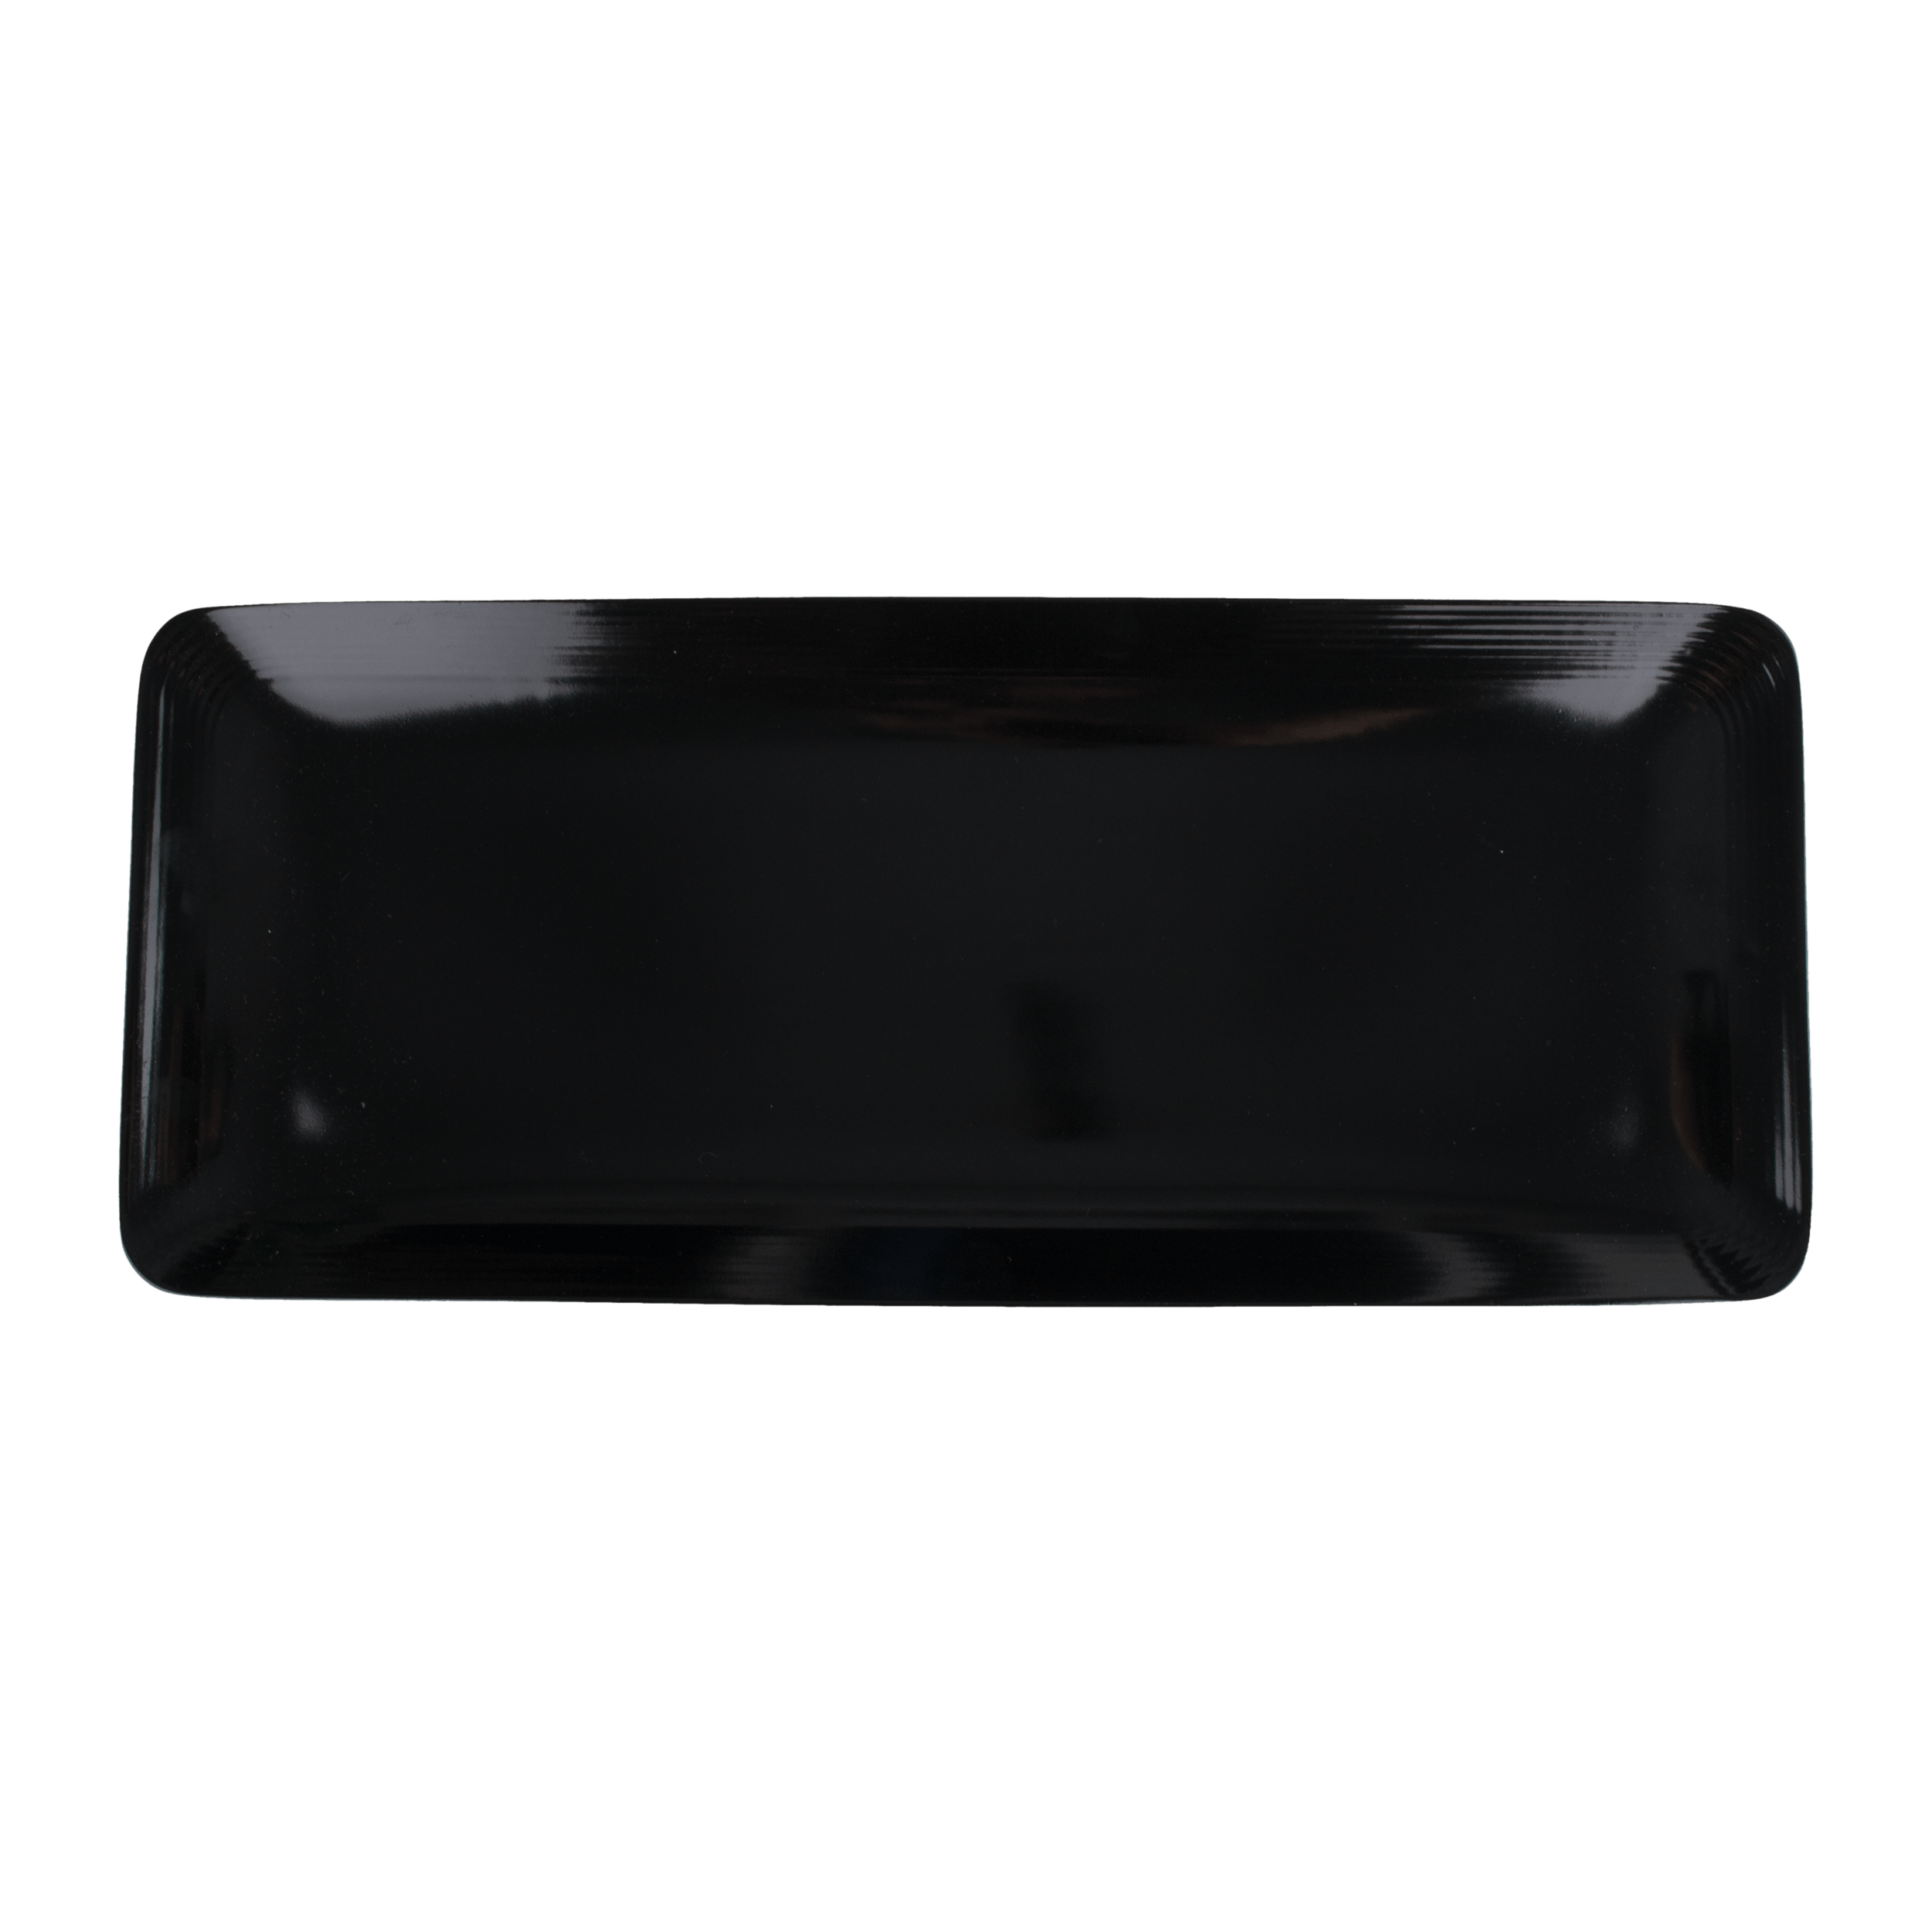 دیس رولت 30 رلیف چینی تقدیس مدل رلیف رنگ مشکی